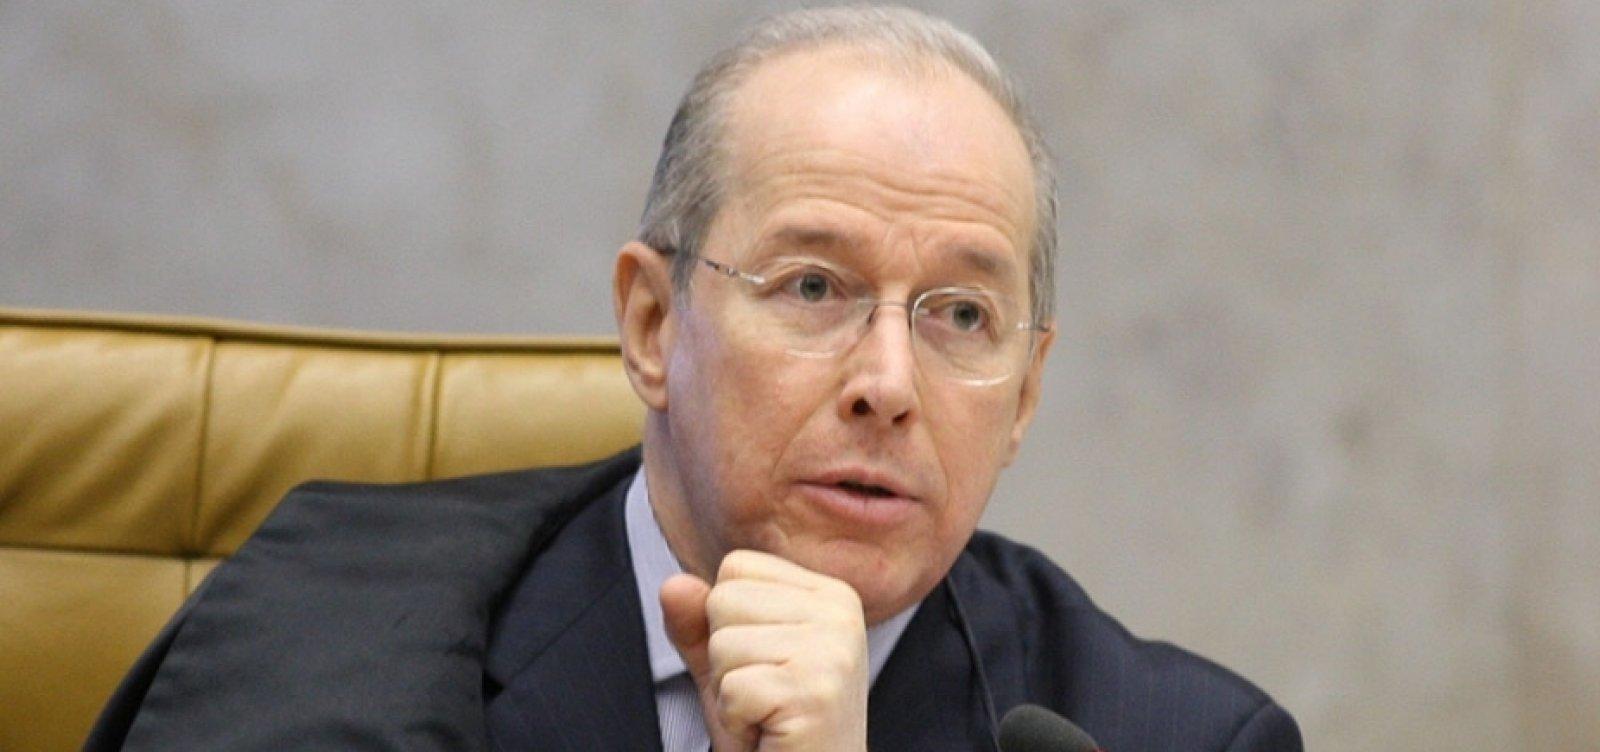 Celso de Mello deve deferir abertura de inquérito para investigar Bolsonaro nesta segunda-feira